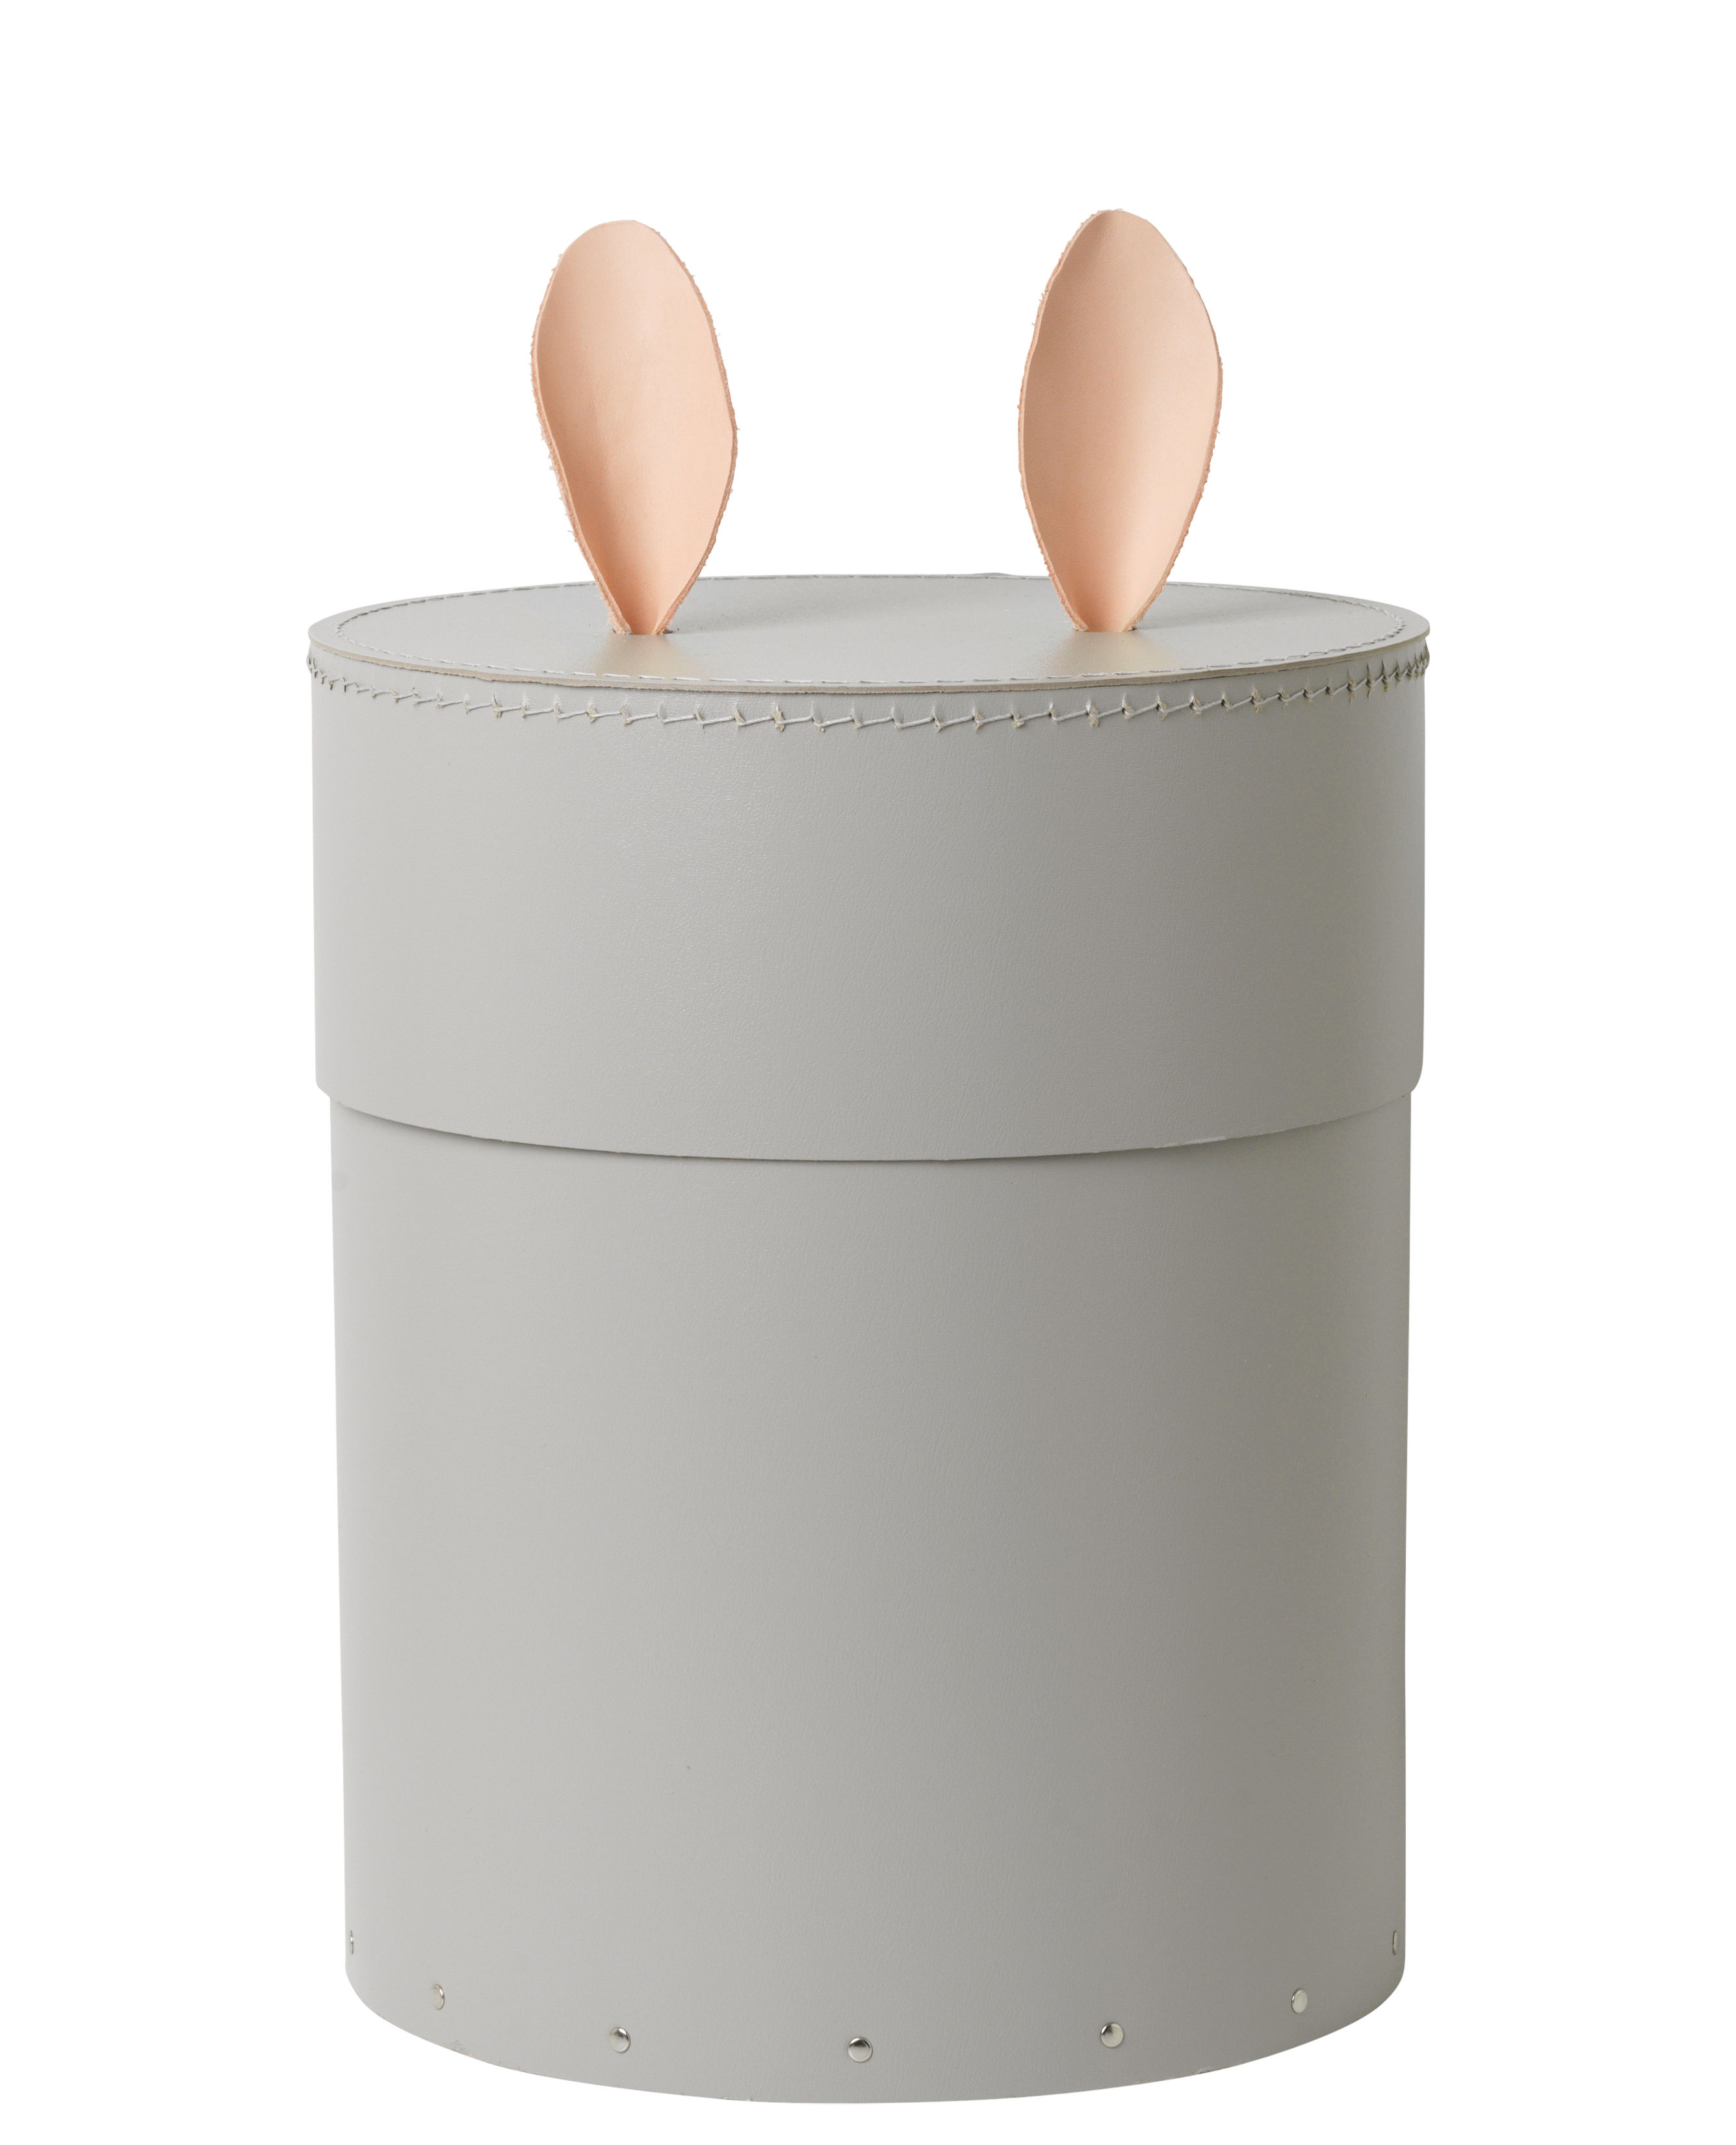 Furniture - Kids Furniture - Rabbit Box - / Ø 30 x H 35 cm by Ferm Living - Grey / Natural leather - Cardboard, Leather